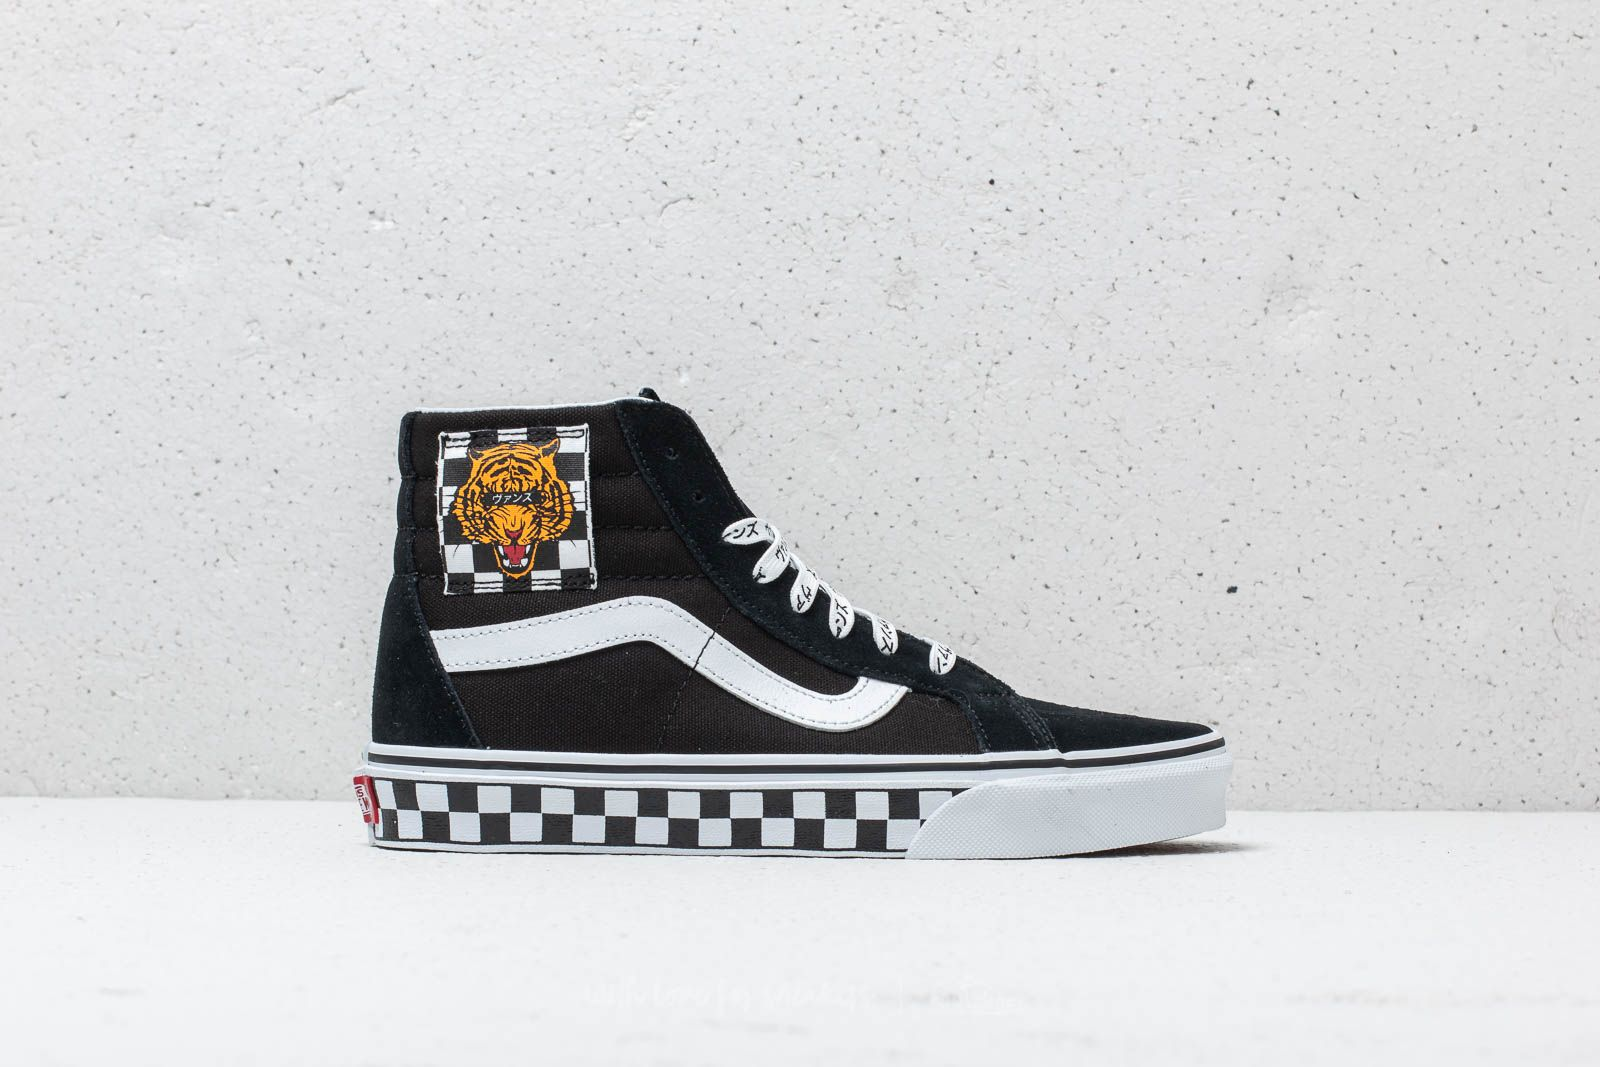 shoes Vans (Tiger Check) Sk8-Hi Reissue